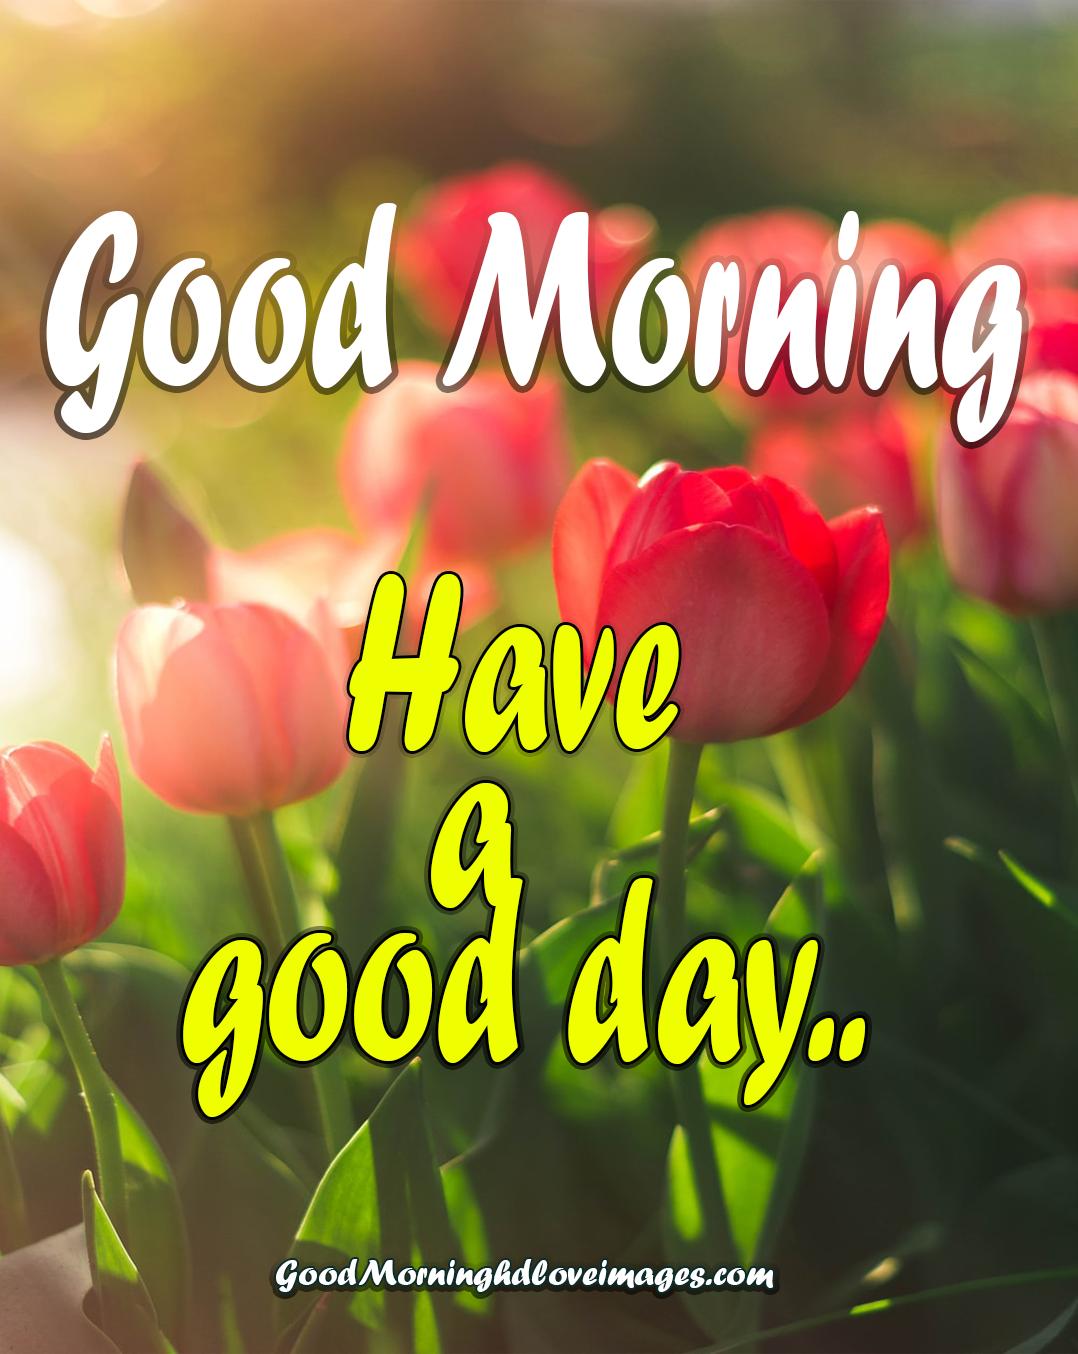 Good Morning Flower Images Free Download Good Morning